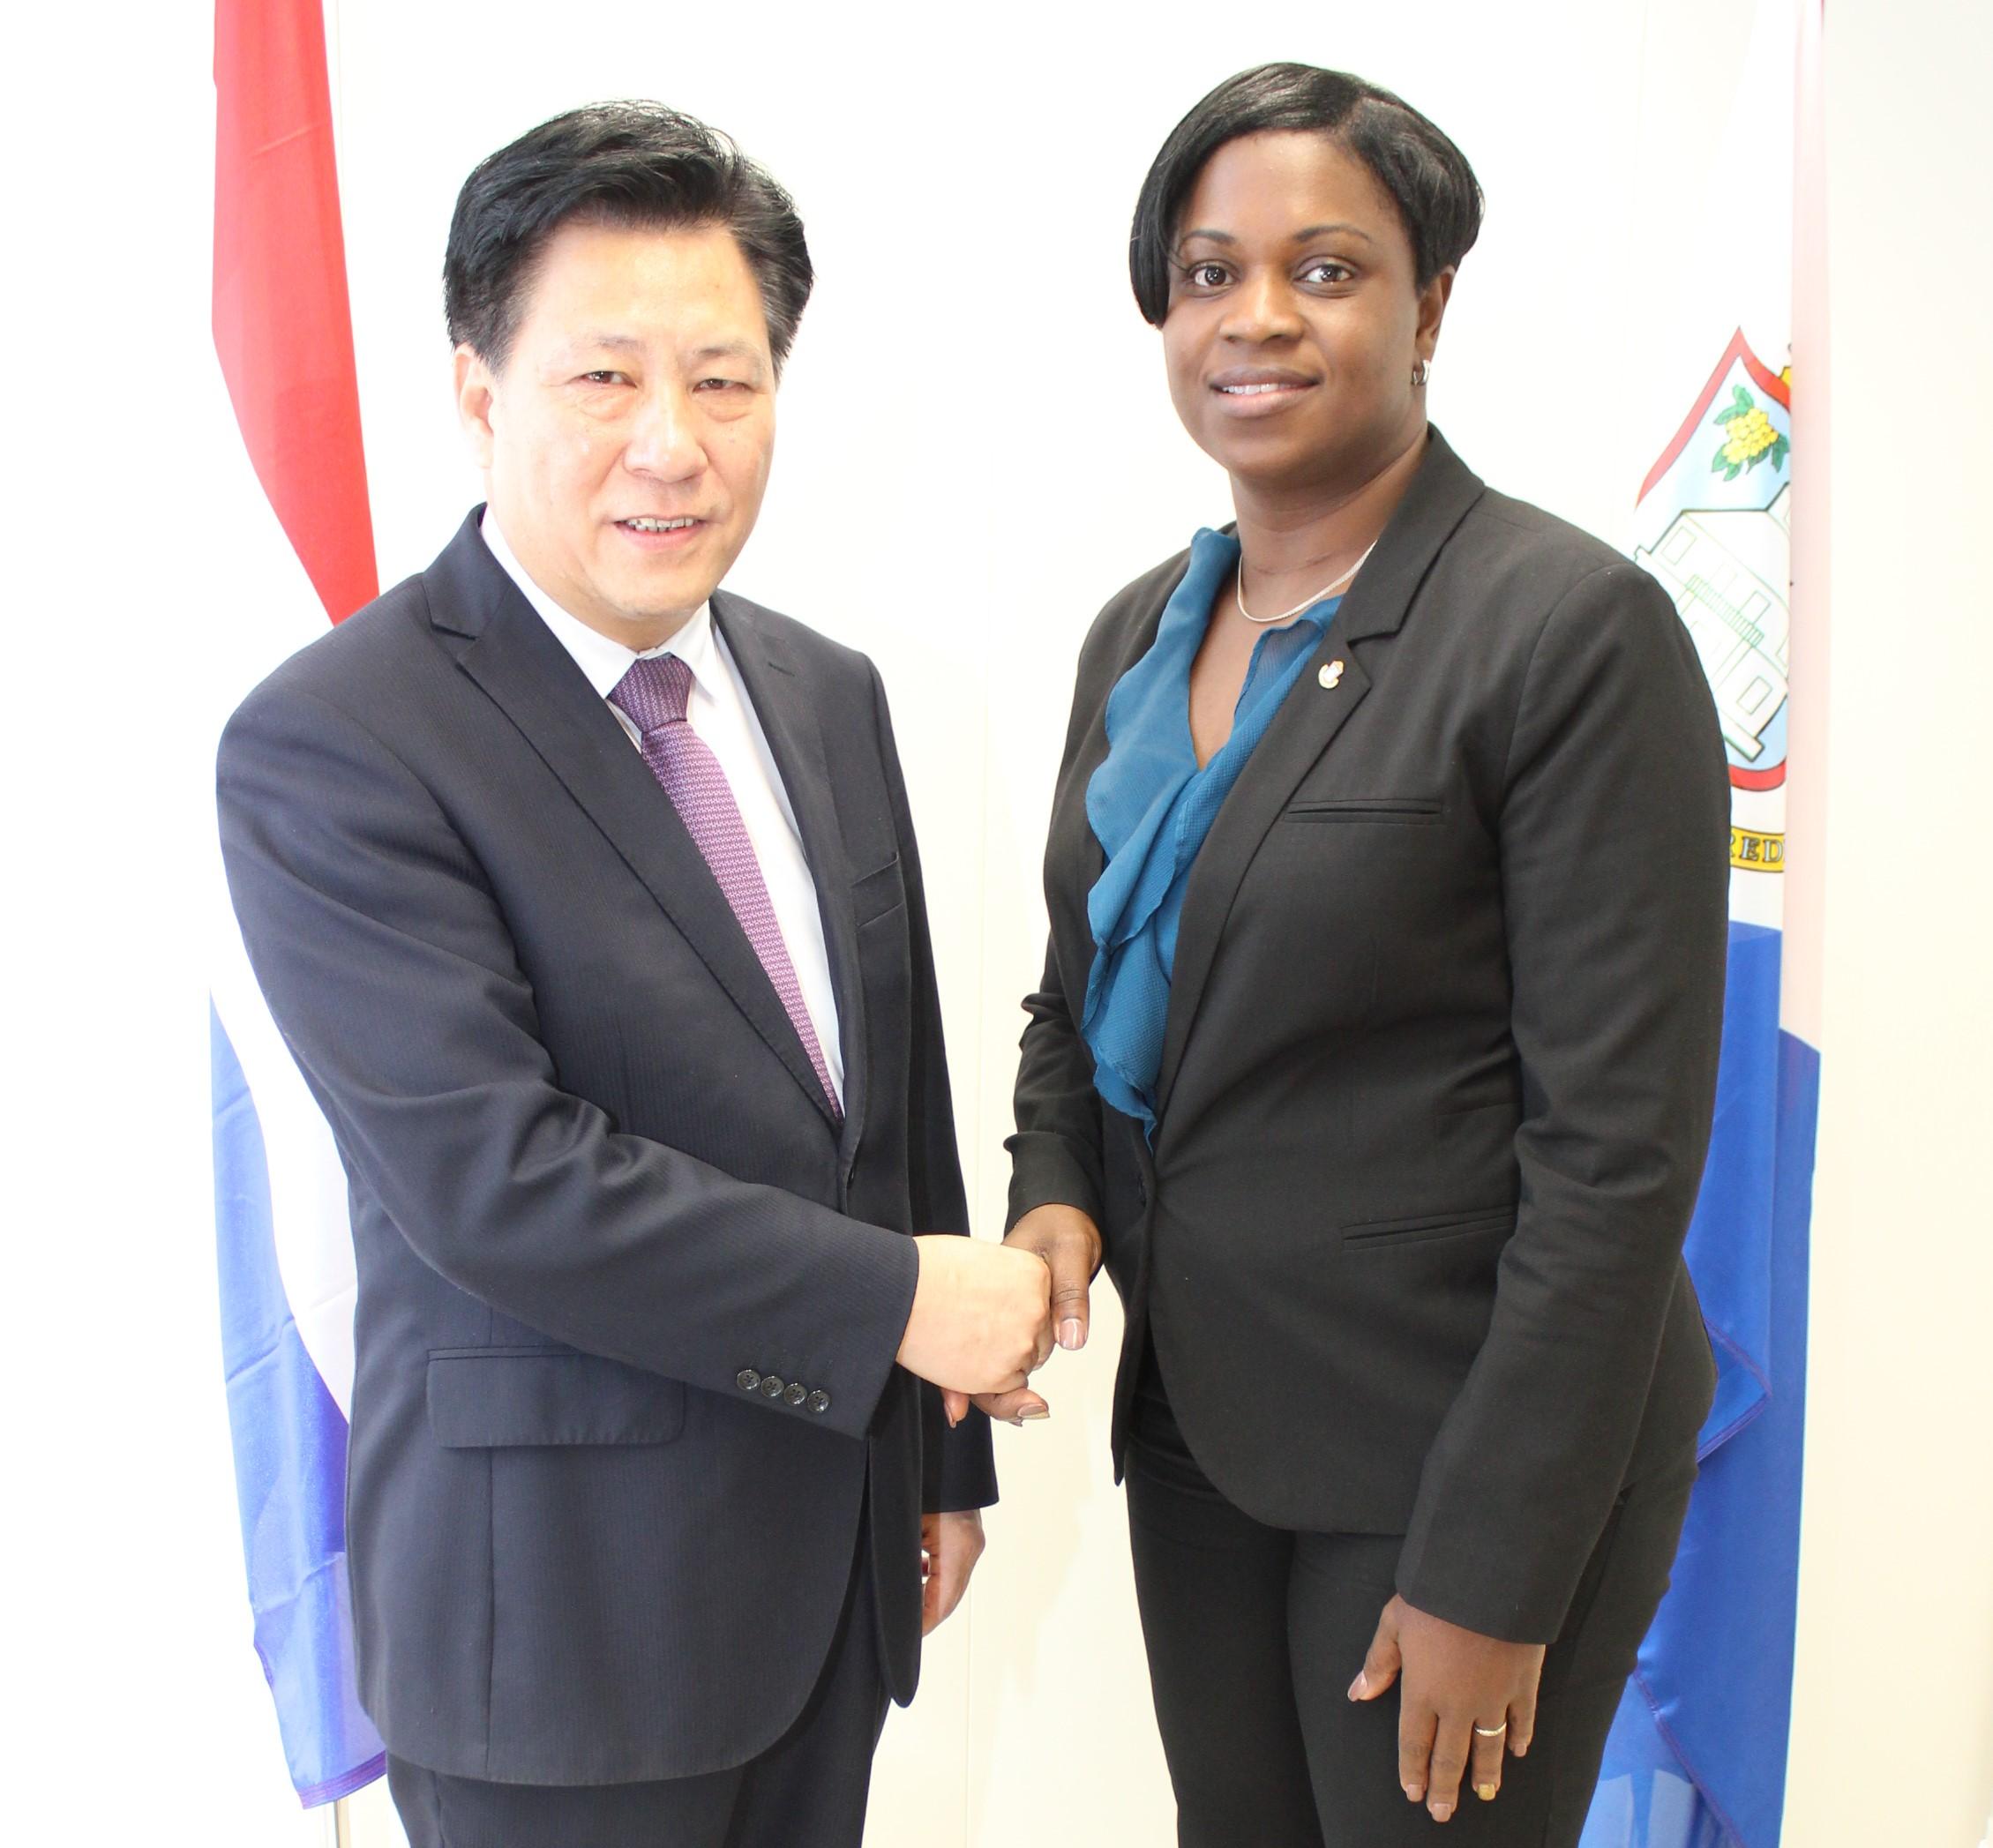 Chinese Consul courtesy visit PM Leona Marlin-Romeo